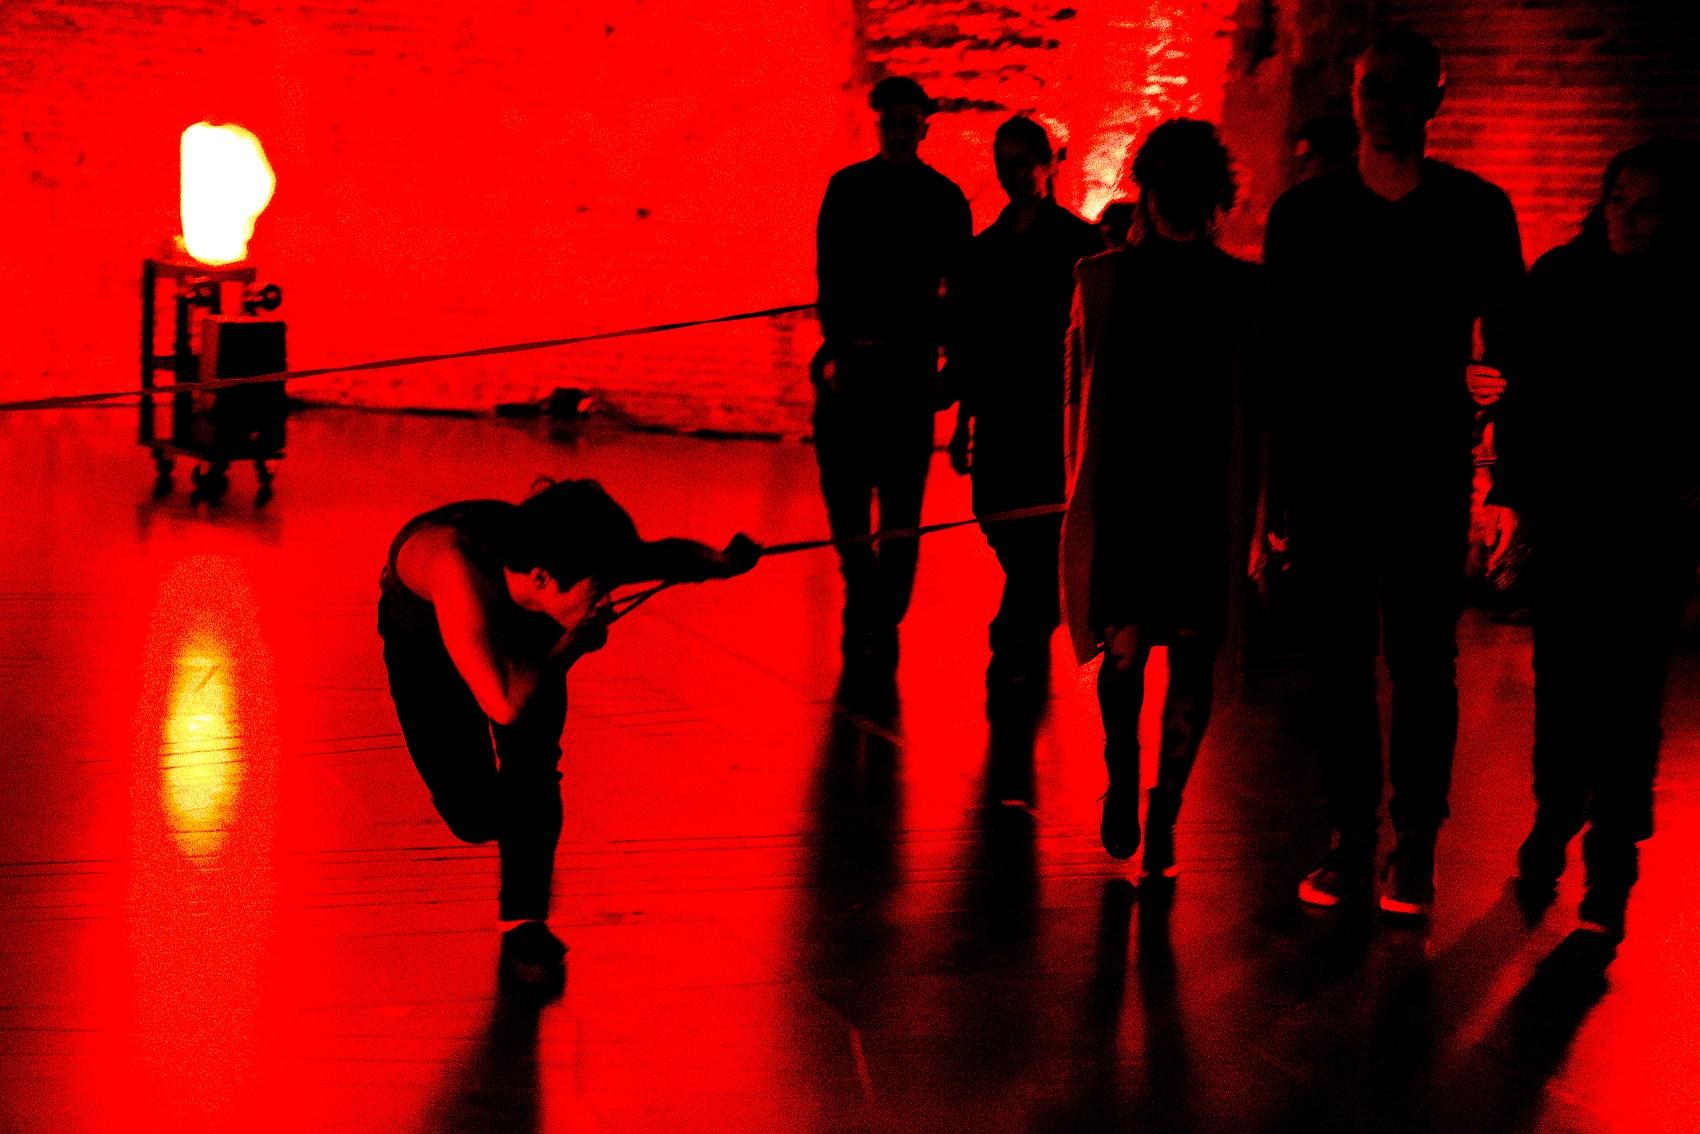 H Ultima Vez και ο Wim Vandekeybus στο 24ο Διεθνές Φεστιβάλ Χορού Καλαμάτας | Go Figure Out yourself |